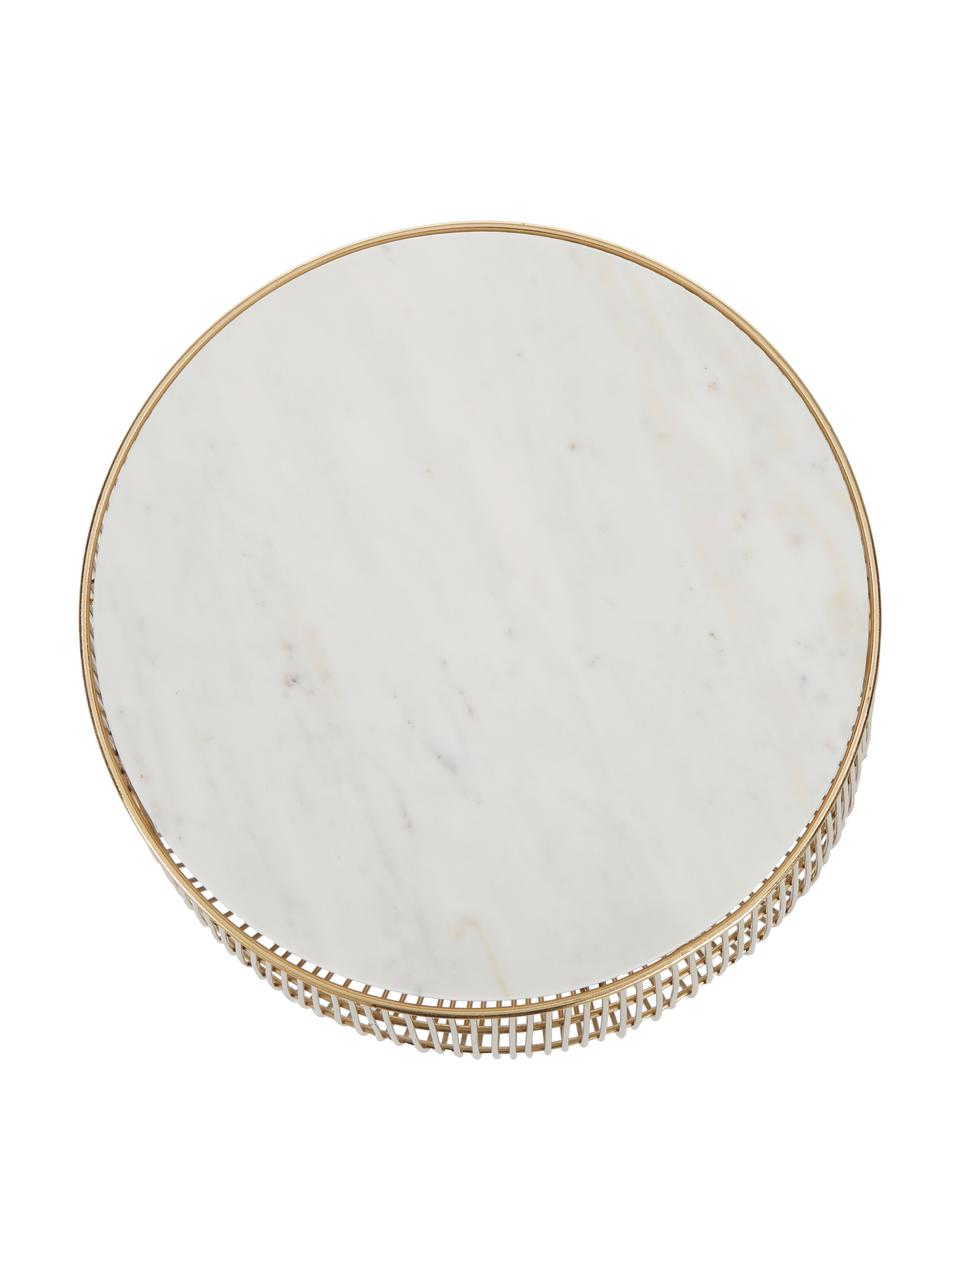 XS Beistelltisch Beam mit Marmor-Platte, Gestell: Metall, vermessingt, Tischplatte: Marmor, Weiß, Ø 32 x H 35 cm